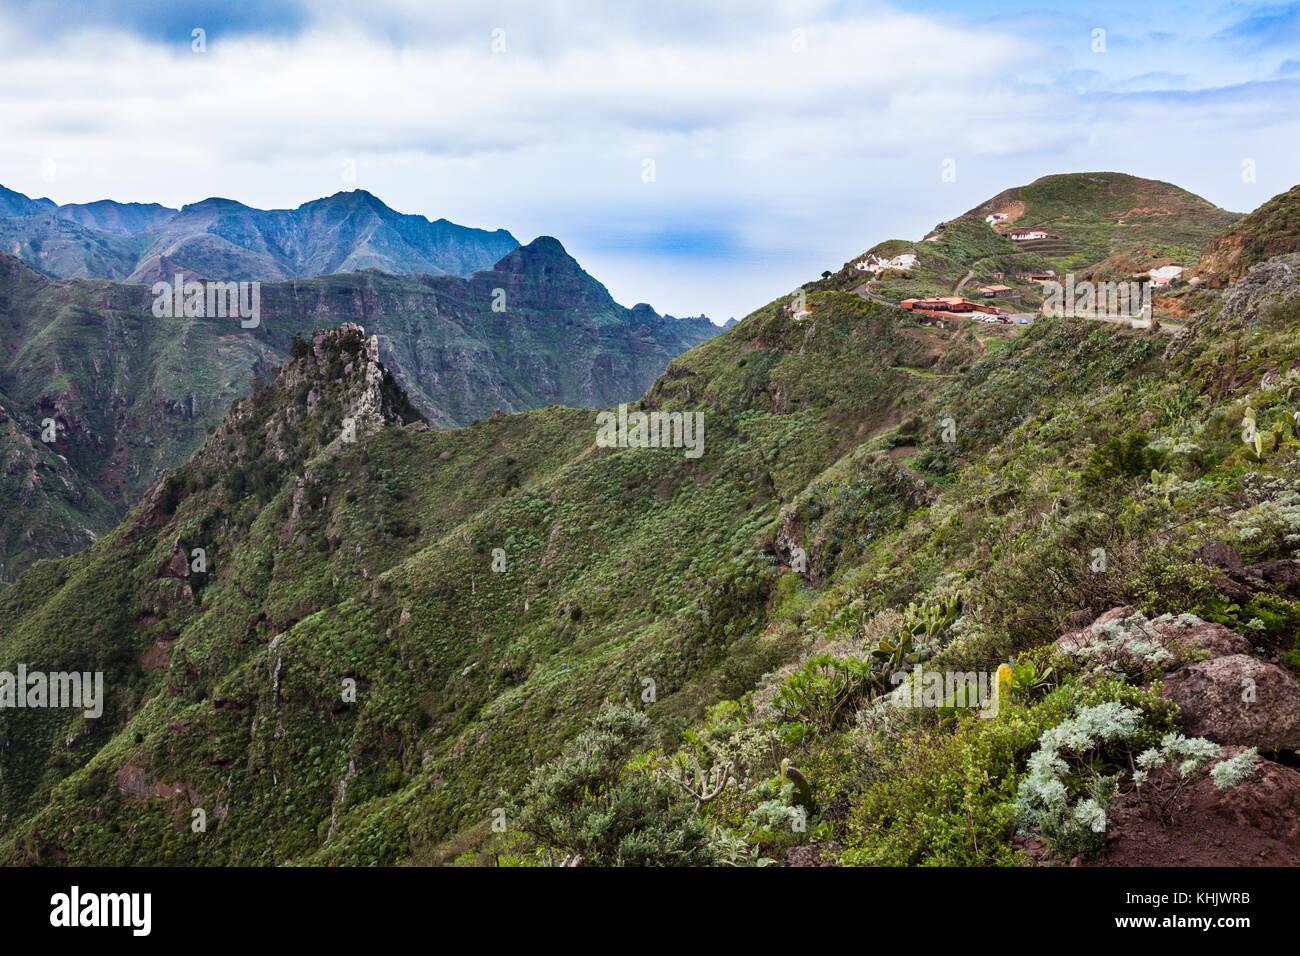 Chinamada Höhle Dorf im Anagagebirge, Teneriffa, Spanien Stockbild